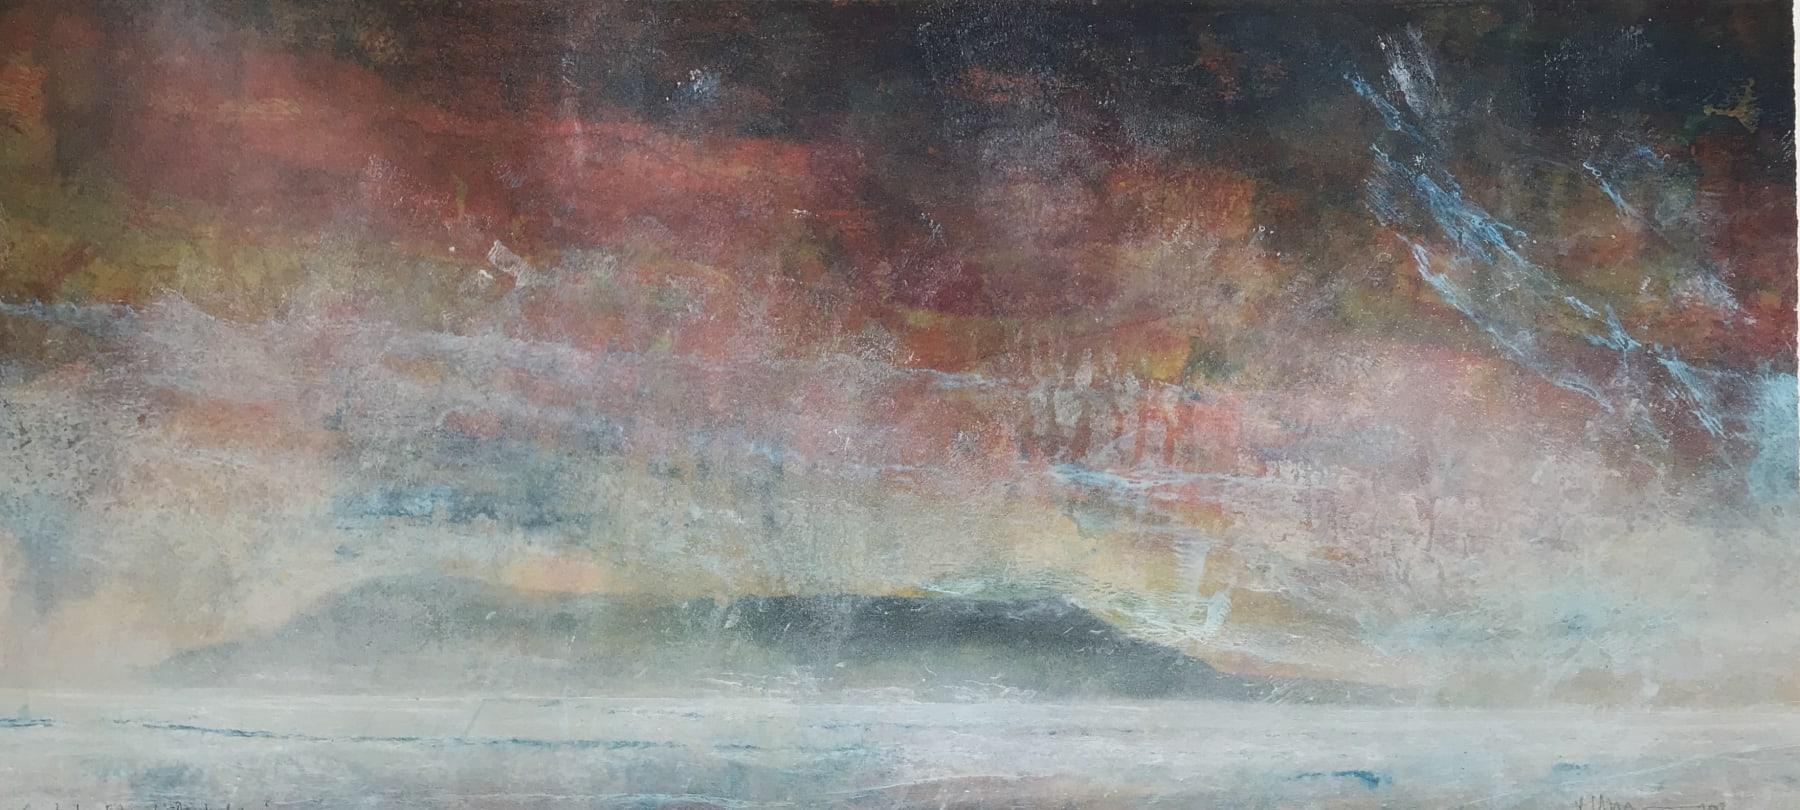 Summer Auction 2020, LOT 80 - Jason Hicklin - 'Grassholme Island, Pembrokeshire', 2003